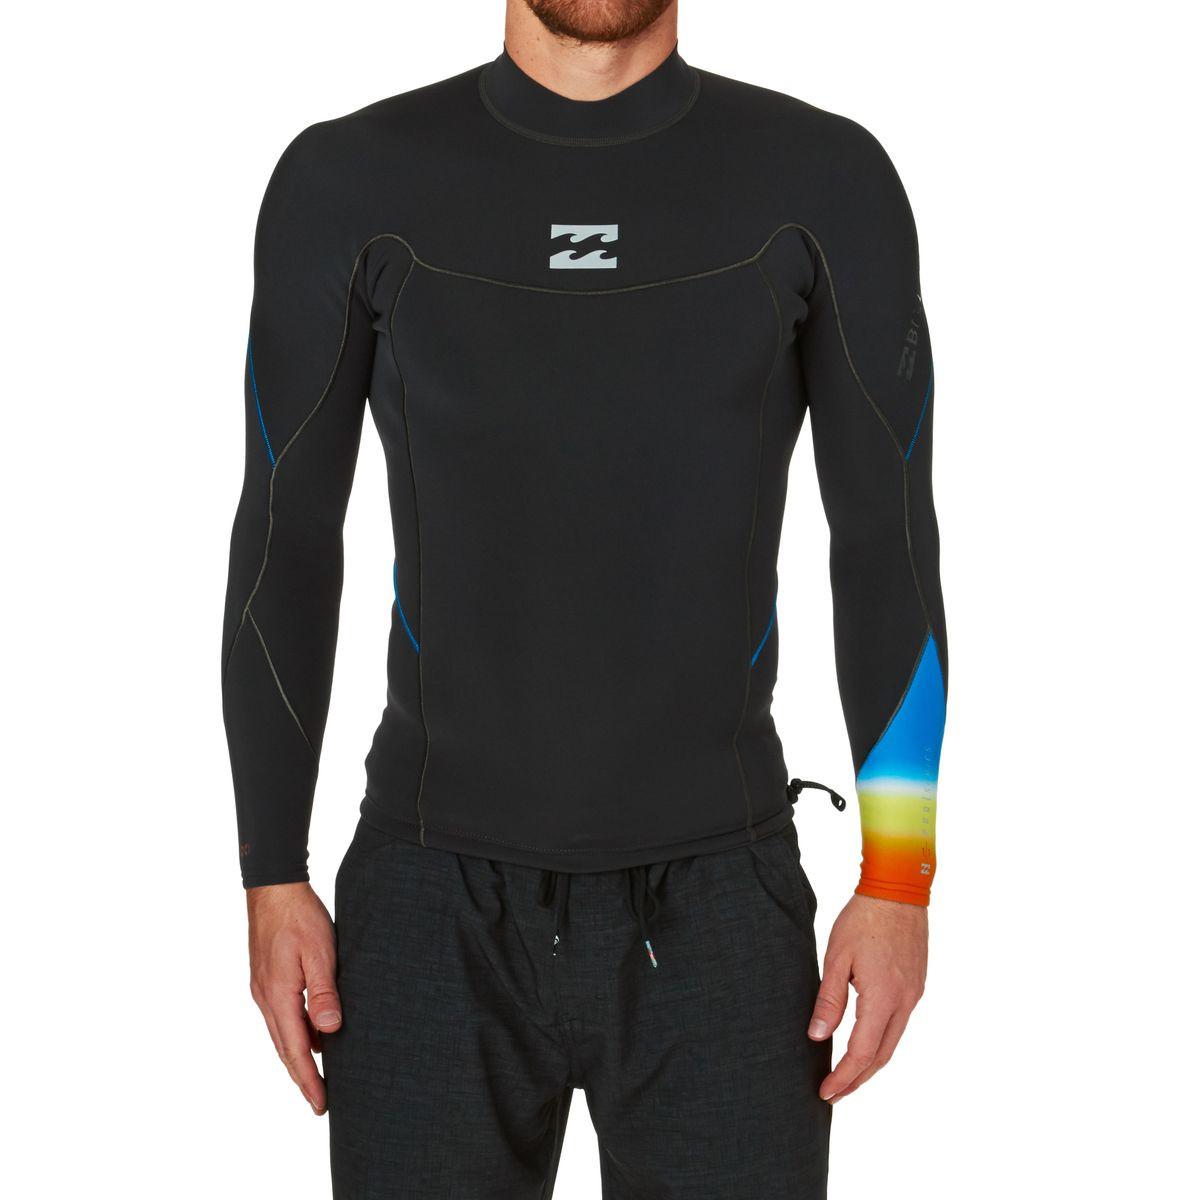 Billabong Pro Series 1mm Long Sleeve Wetsuit Jacket - Faded